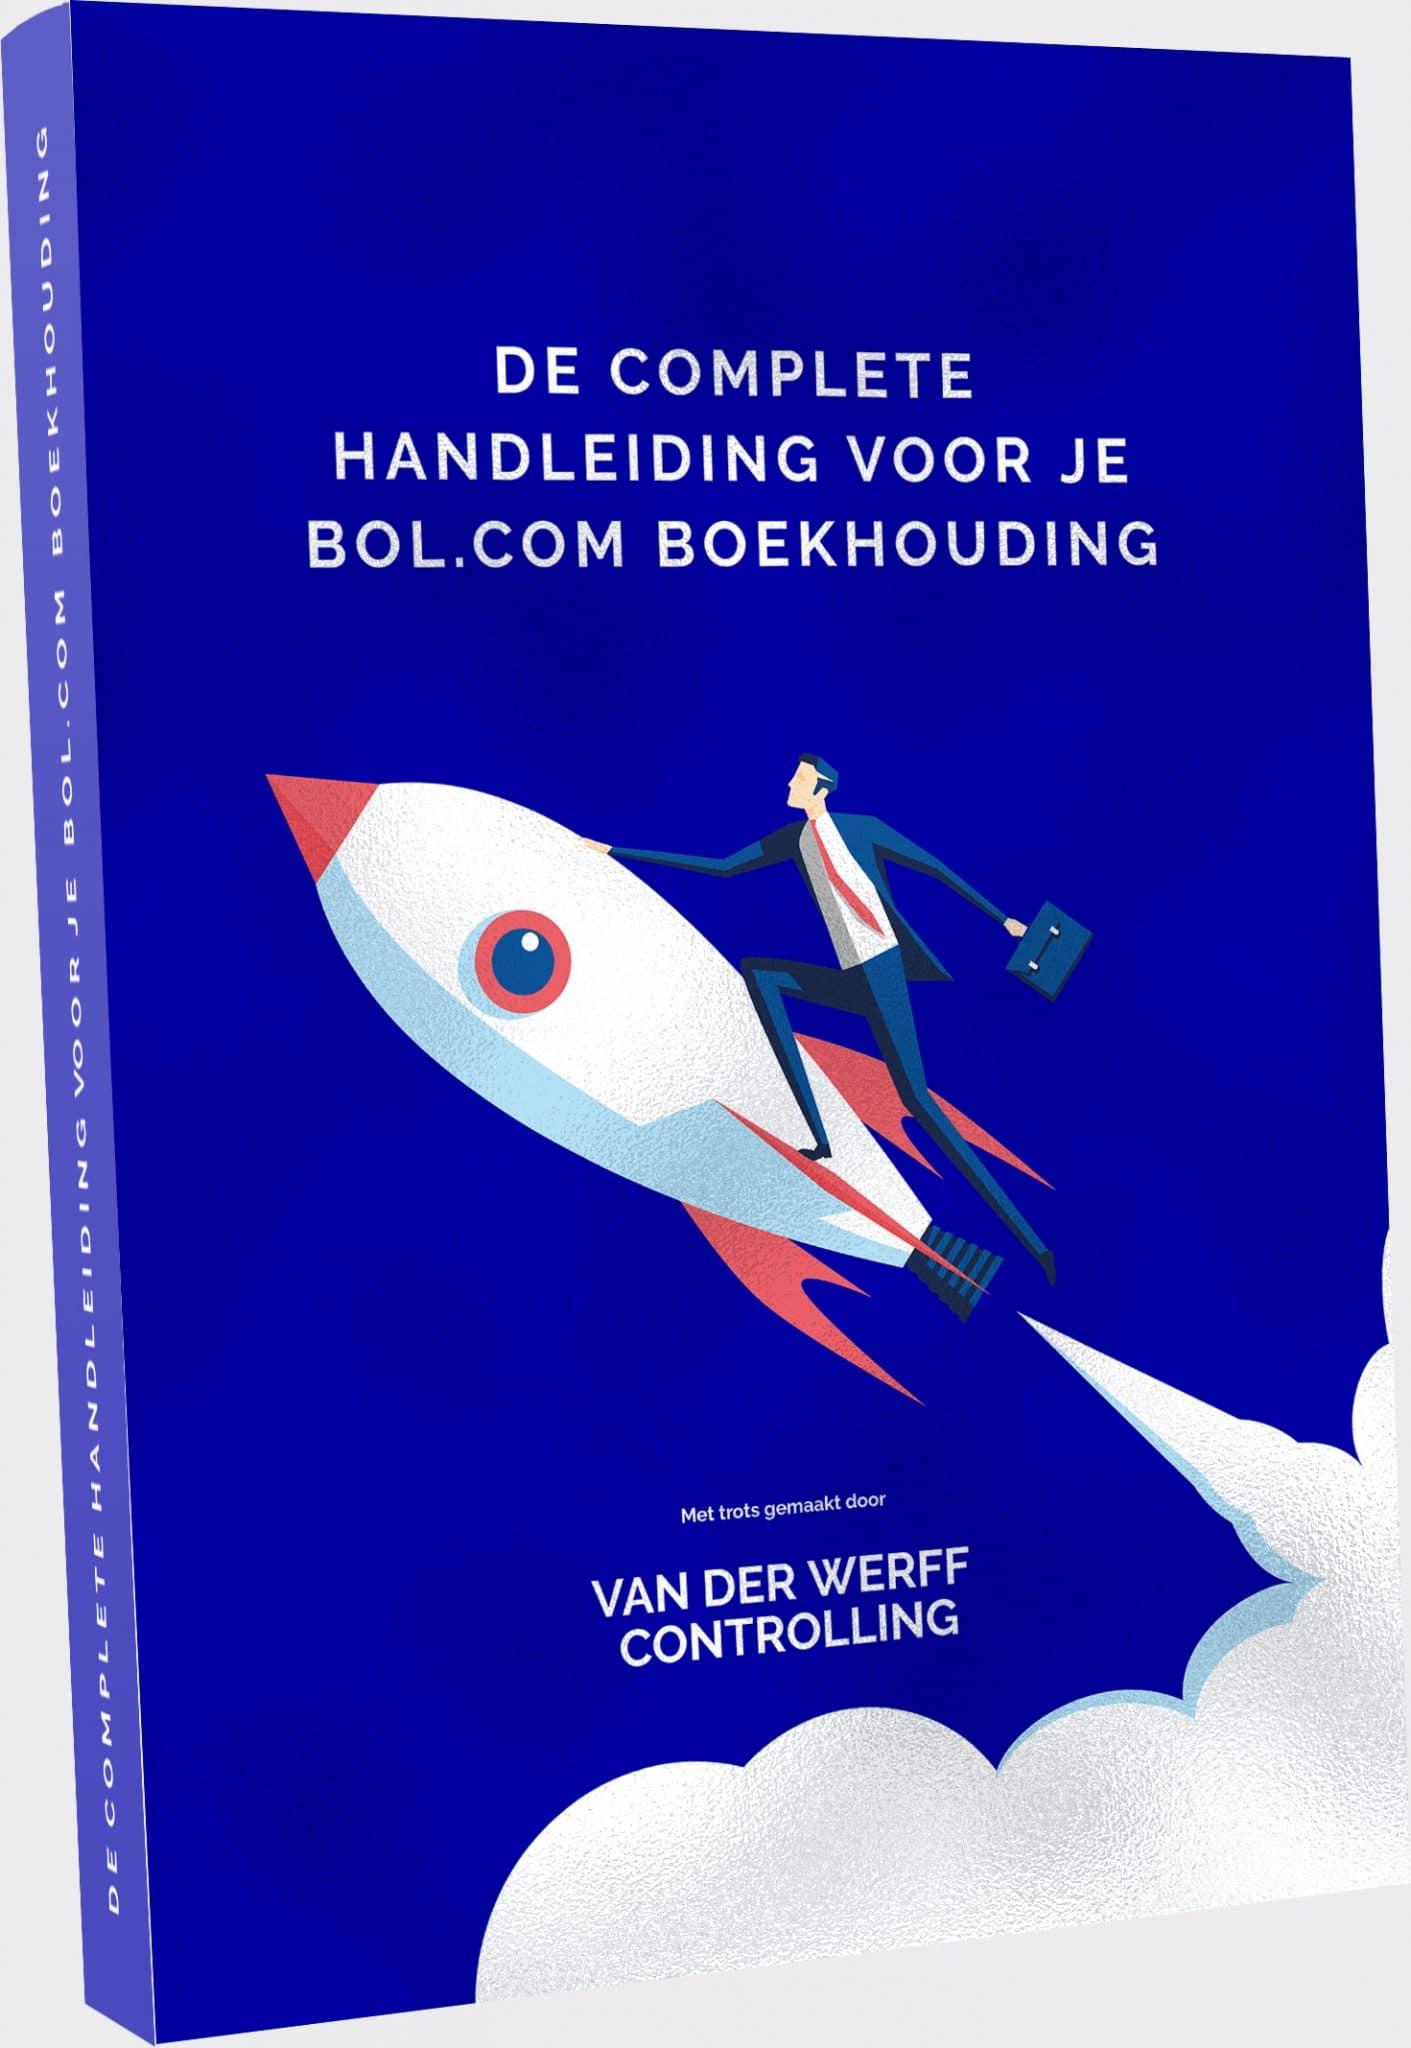 book-mockup23